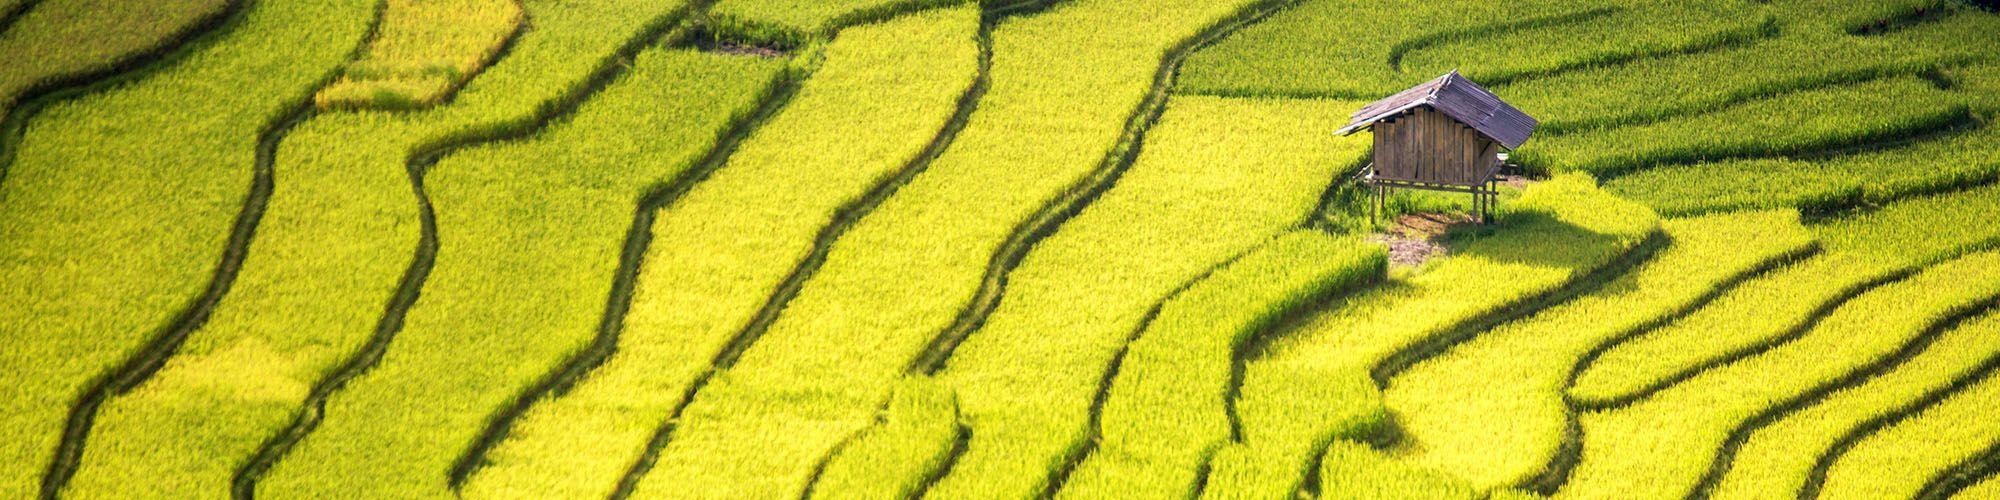 Vietnam, North, Sapa, Rice terraces